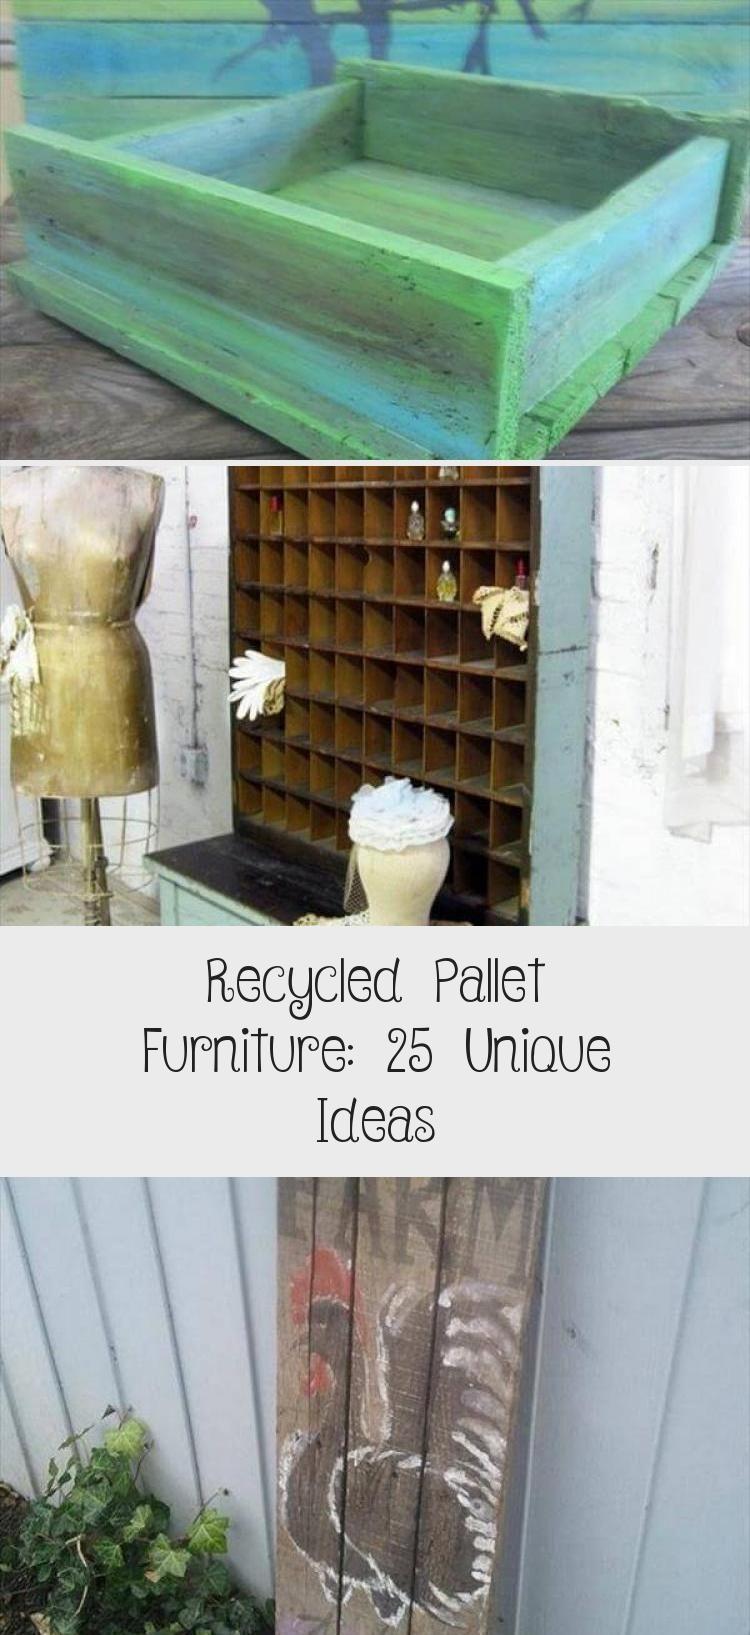 Recycled Pallet Furniture: 25 Unique Ideas - Home Decor ...